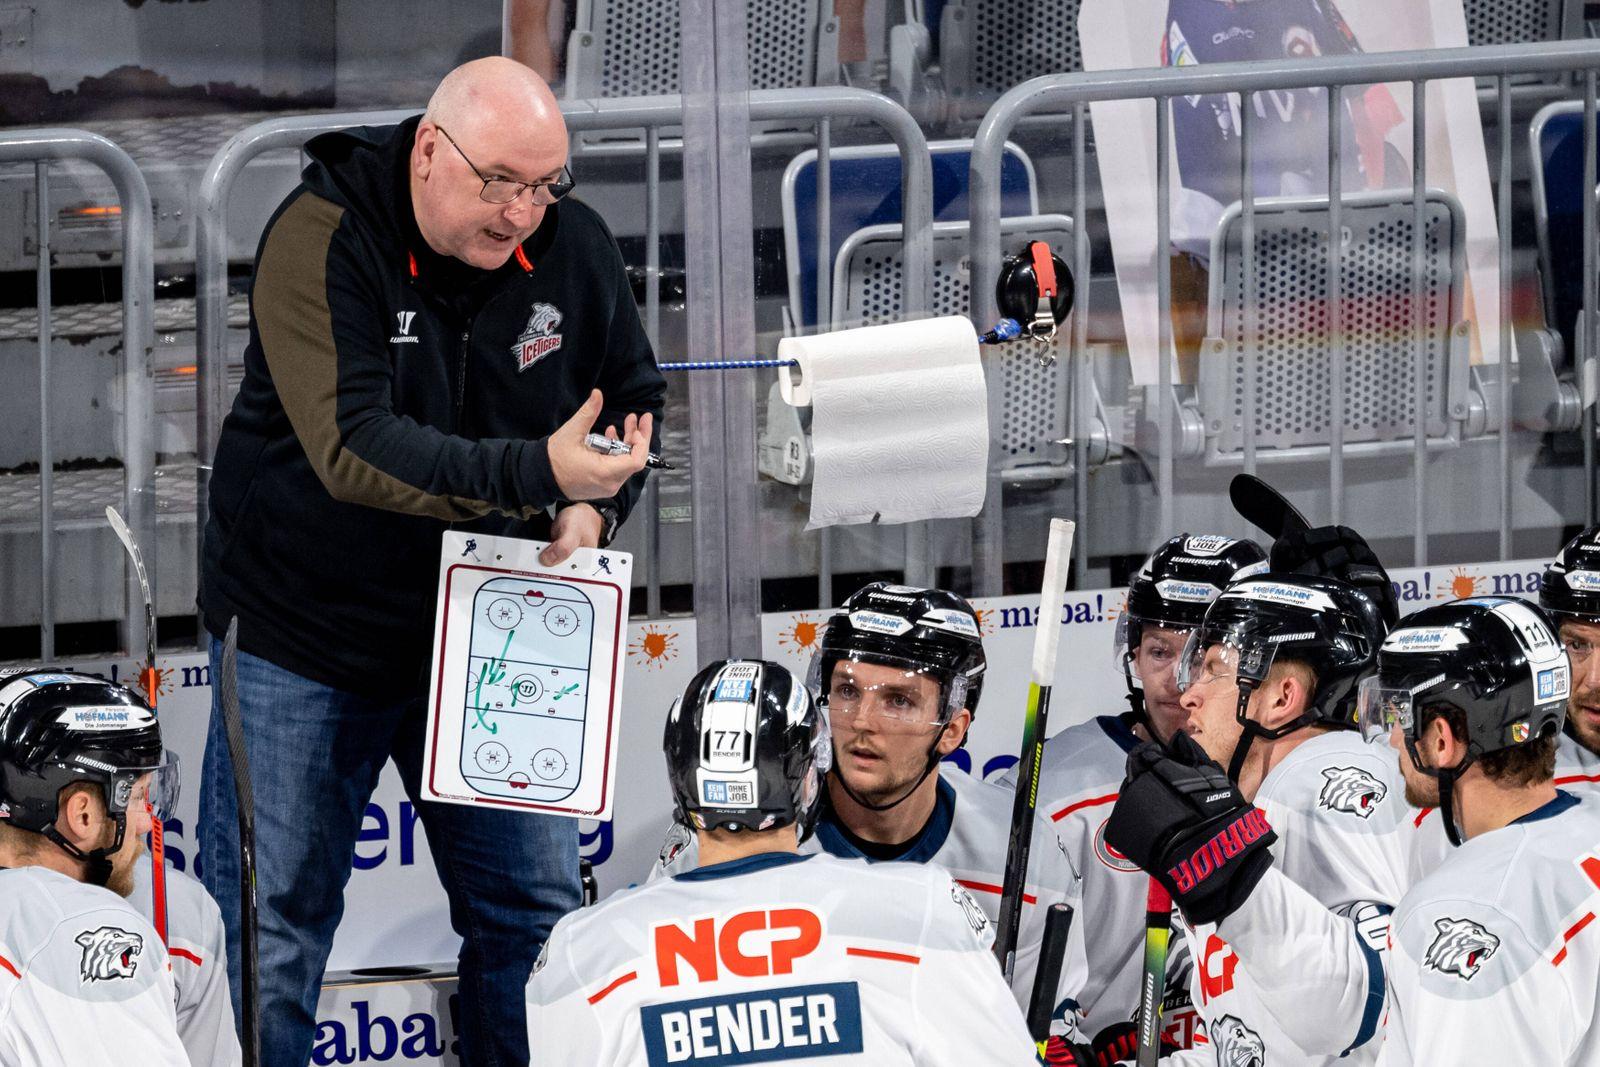 19.12.2020 - Eishockey - Saison 2020 2021 - DEL - Adler Mannheim - Nürnberg Ice Tigers Icetigers - / ThHa - Das Team vo